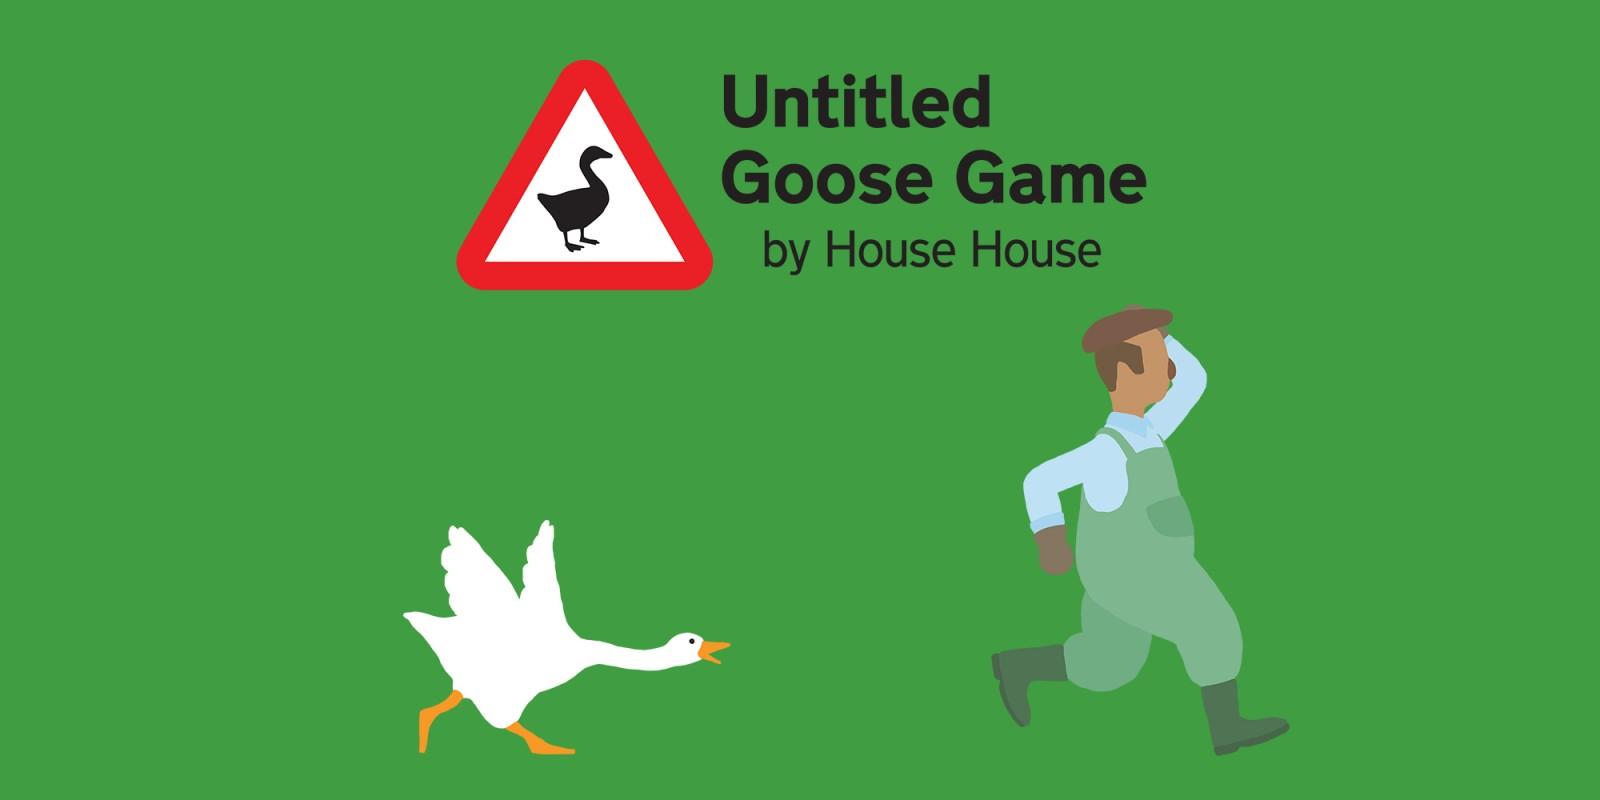 untitled goose game wallpaper 68478